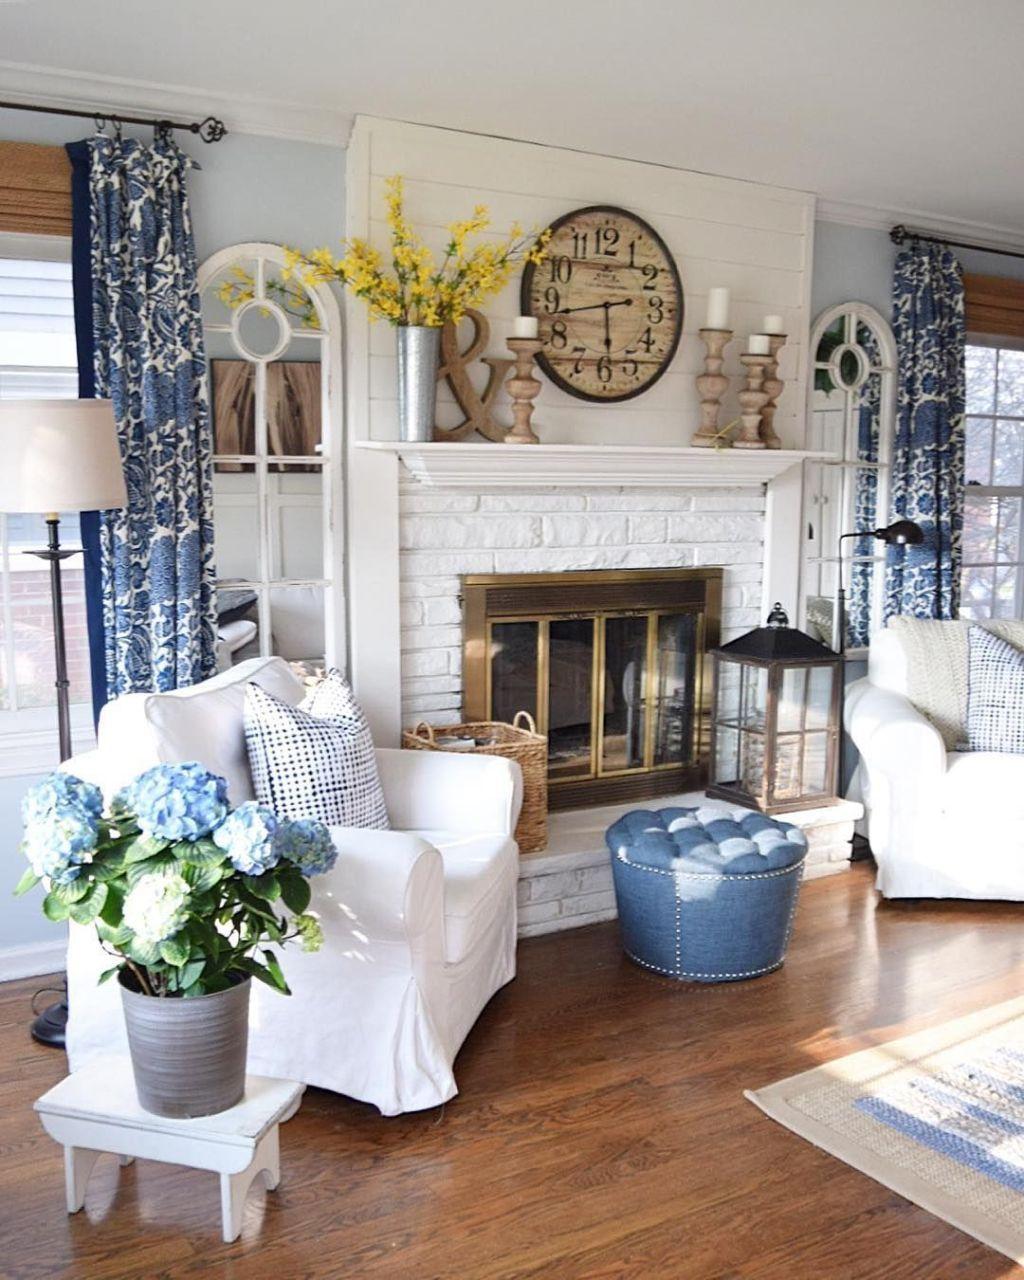 42 Ideas For Living Room Small Rustic Beams Livingroom: BStylish Farmhouse Living Room Curtains Ideas 42